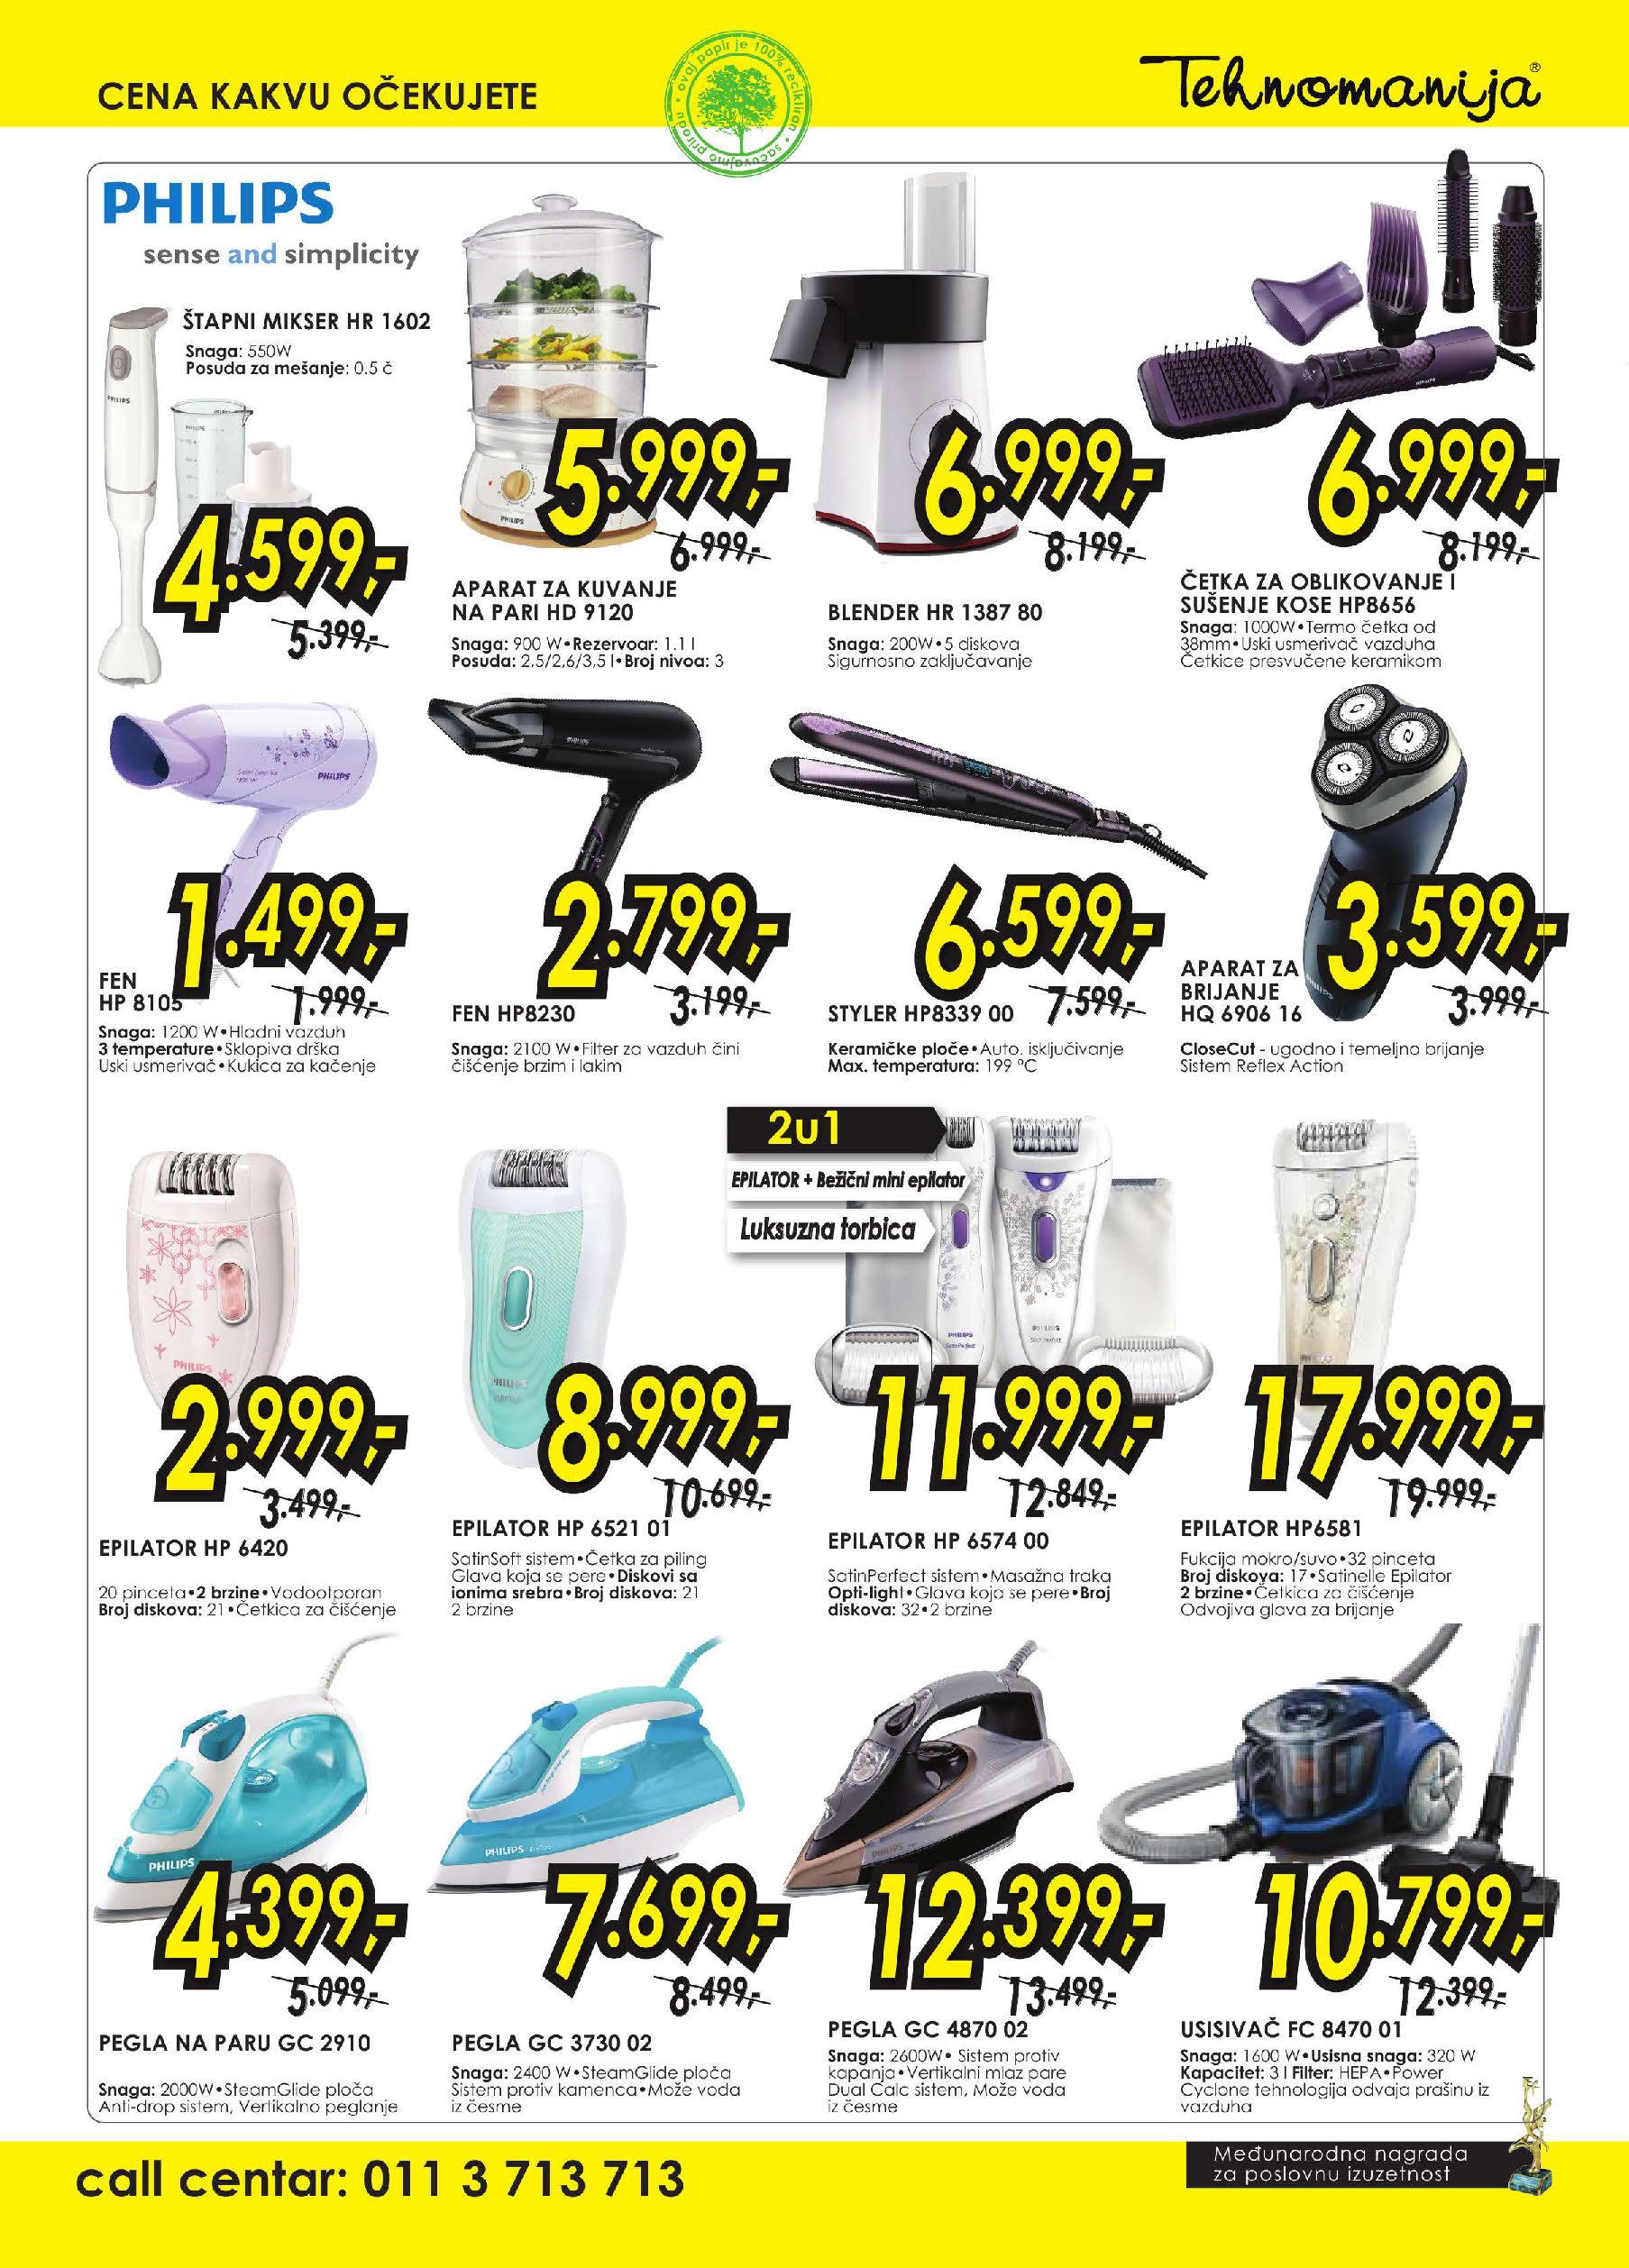 Tehnomanija Katalog kućni aparati